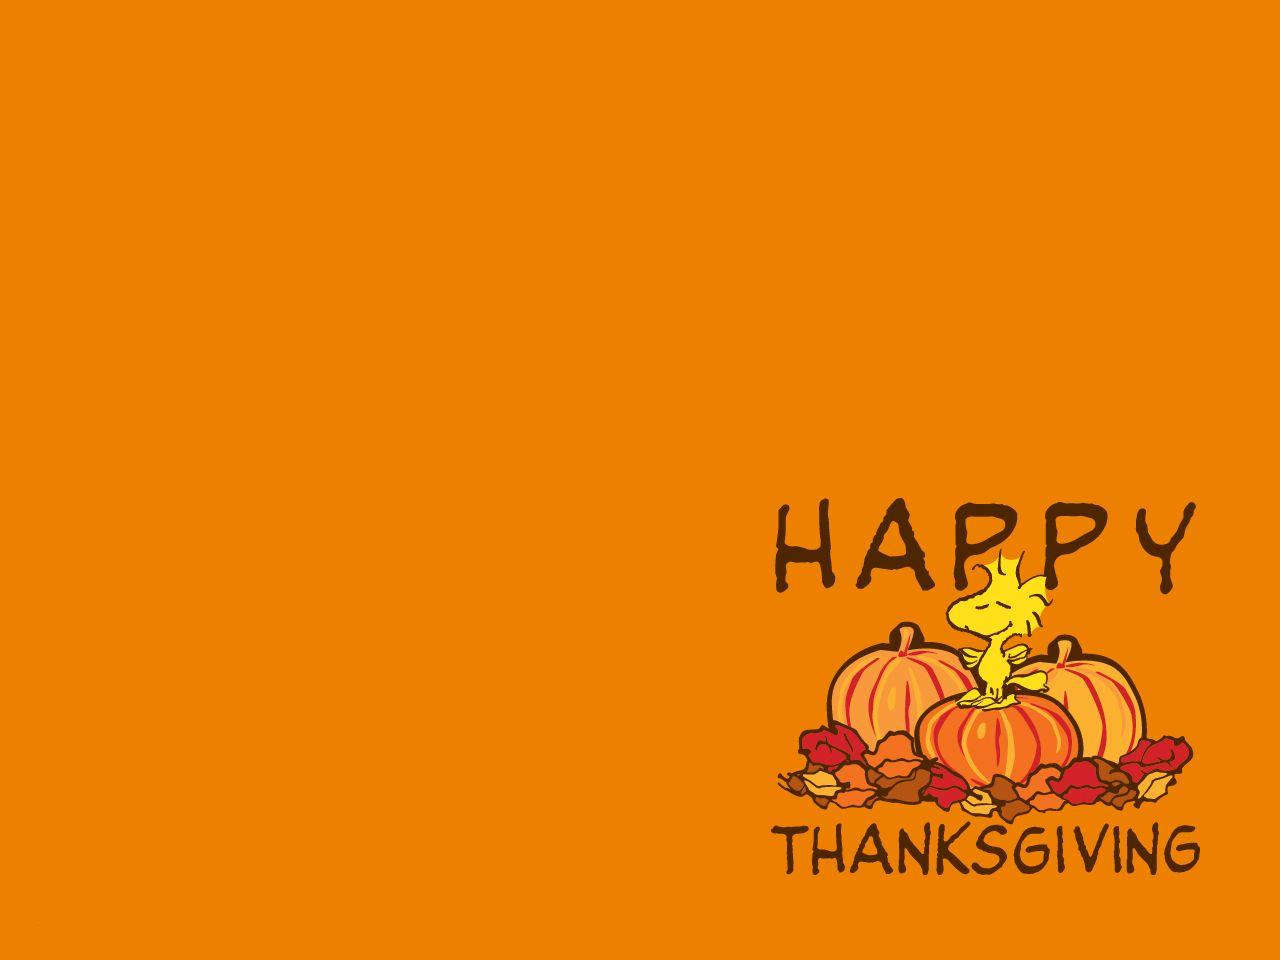 Football Thanksgiving Wallpapers   Top Football Thanksgiving 1280x960